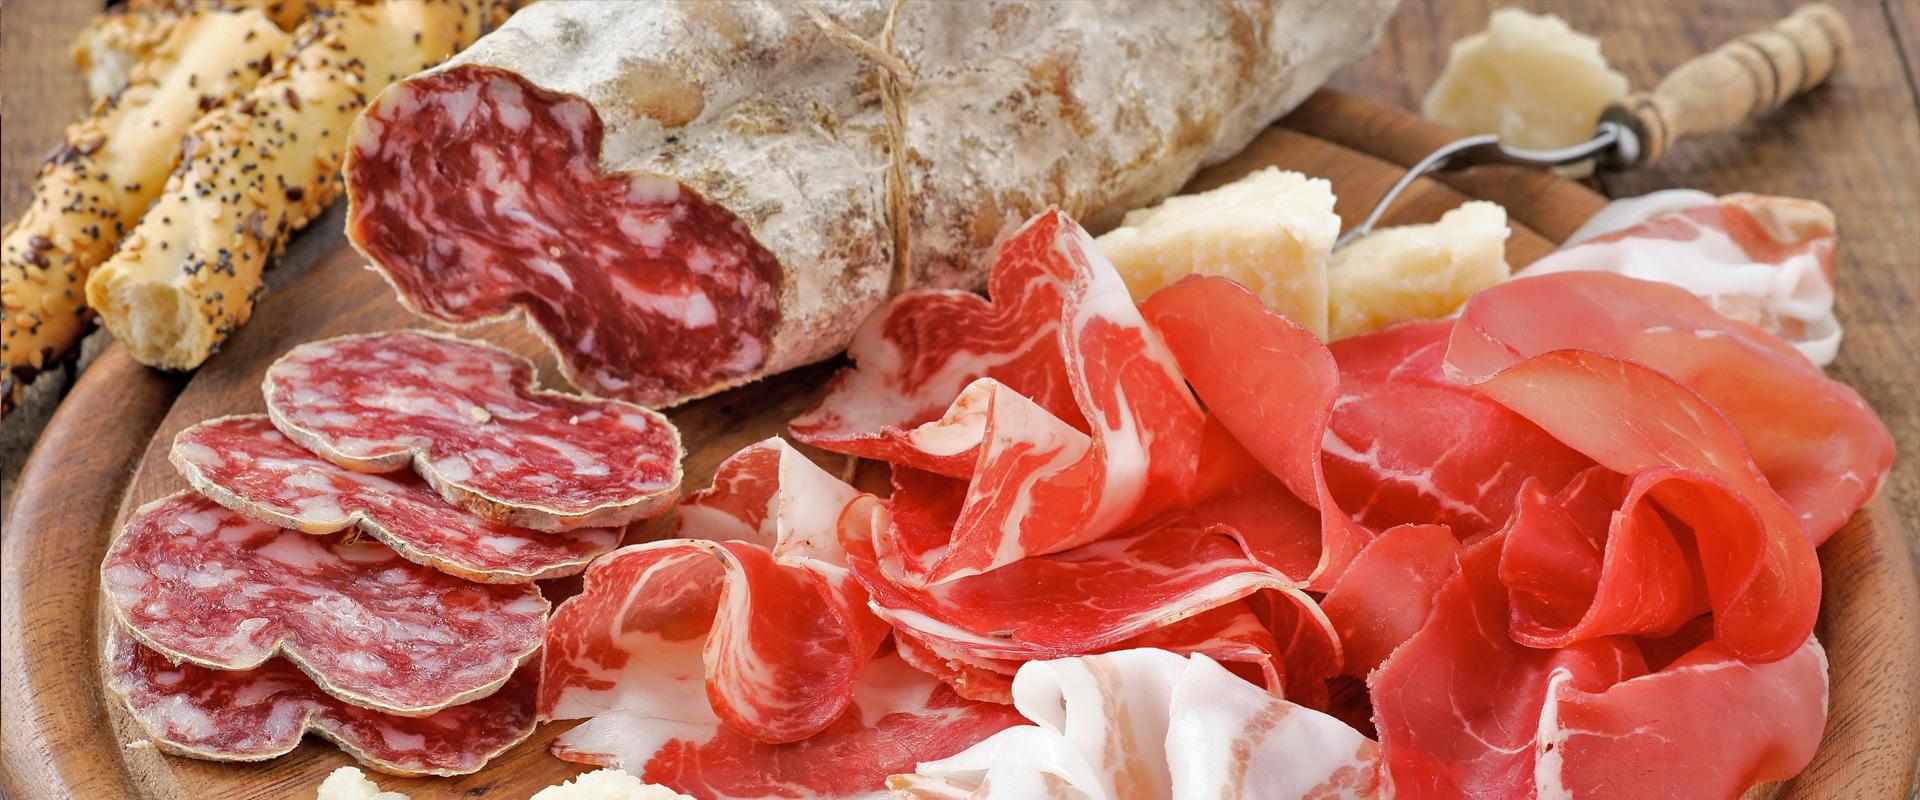 Slow Food Presidia in Emilia Romagna